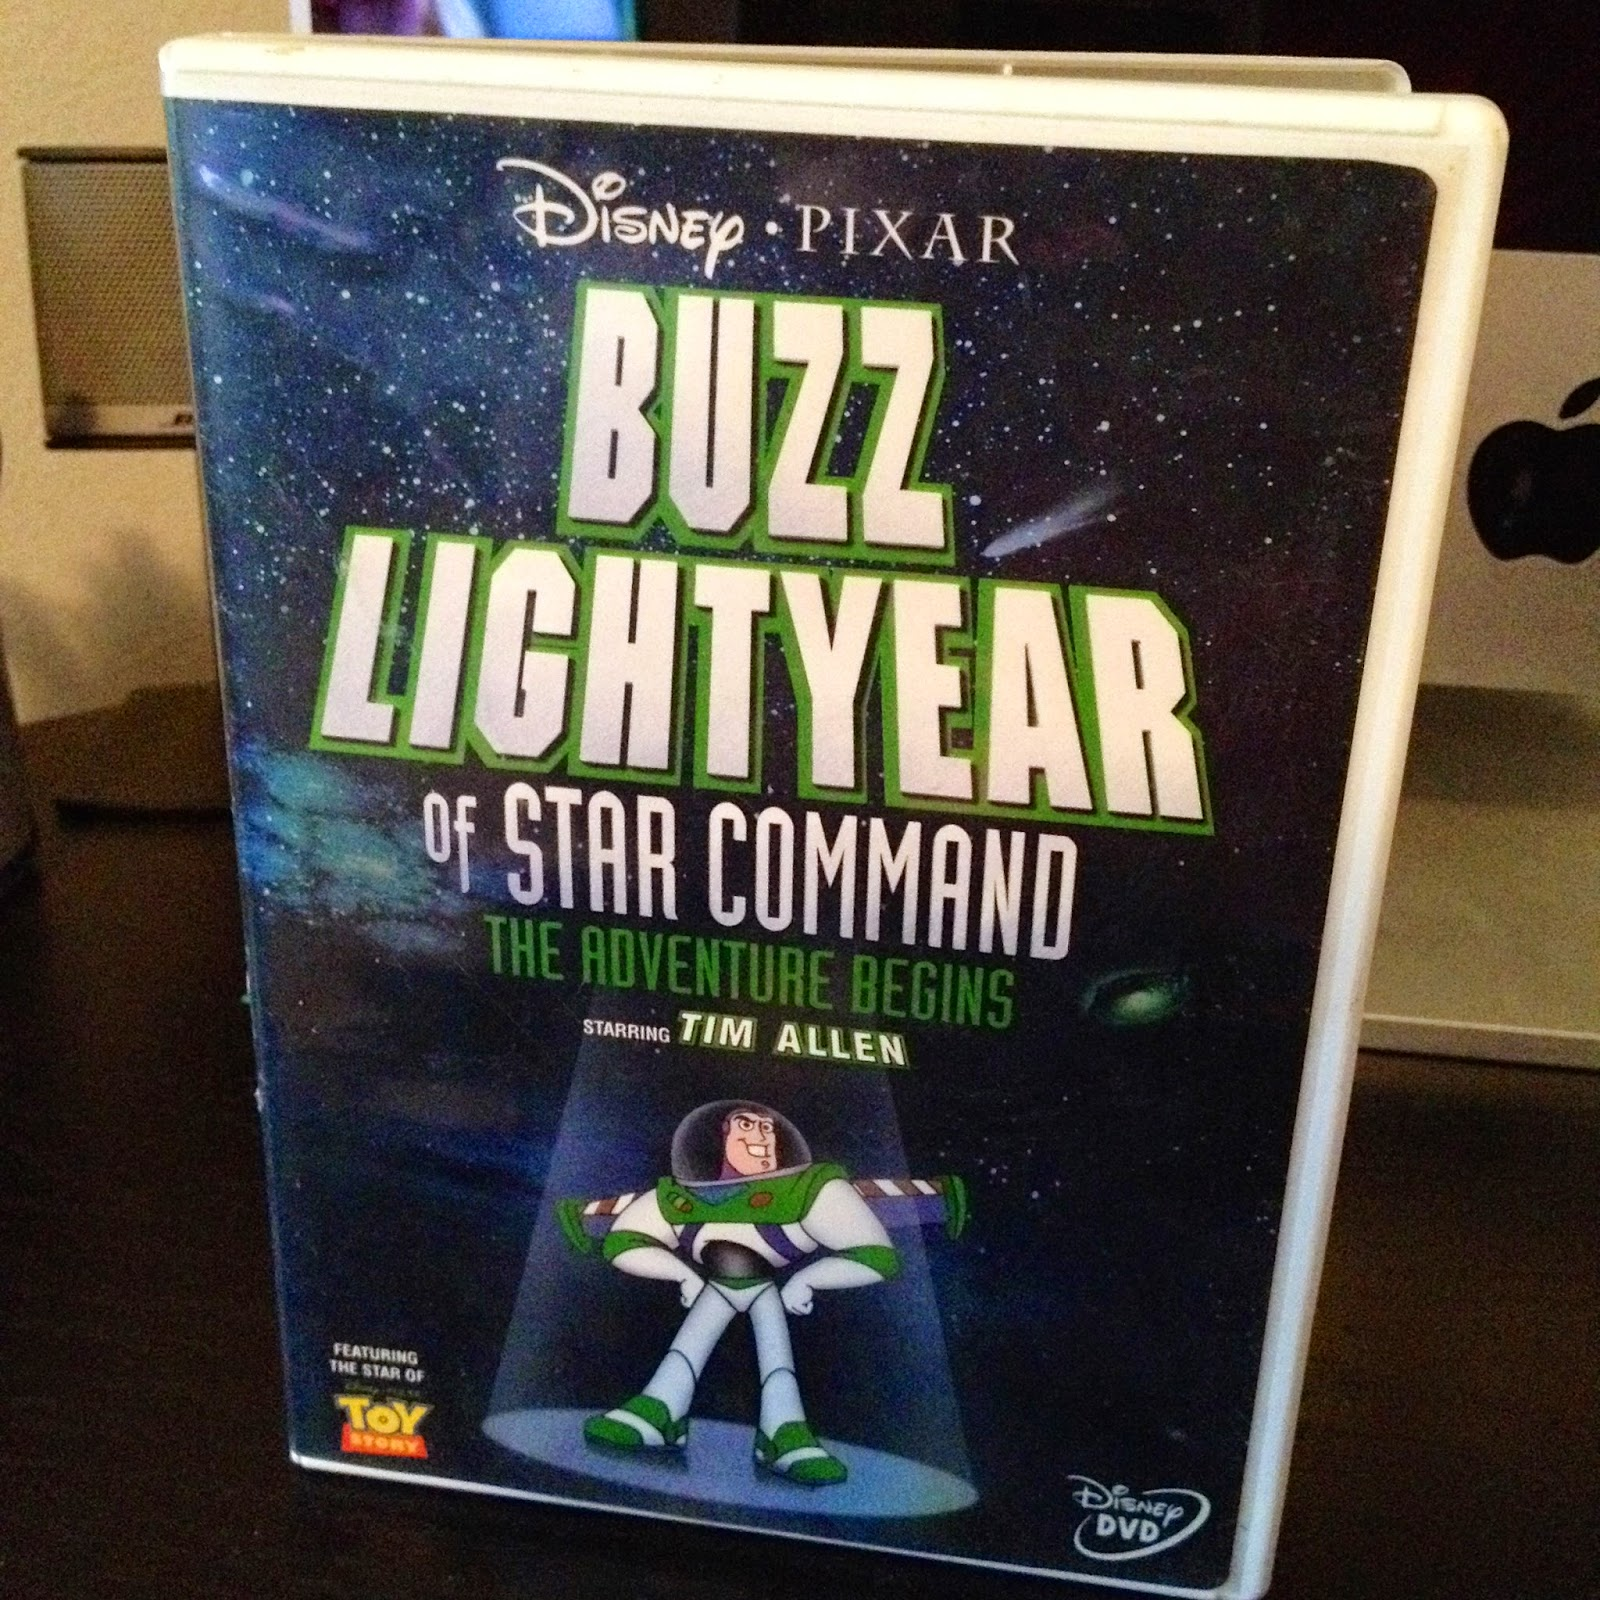 Dan The Pixar Fan Buzz Lightyear Of Star Command Movie Dvd